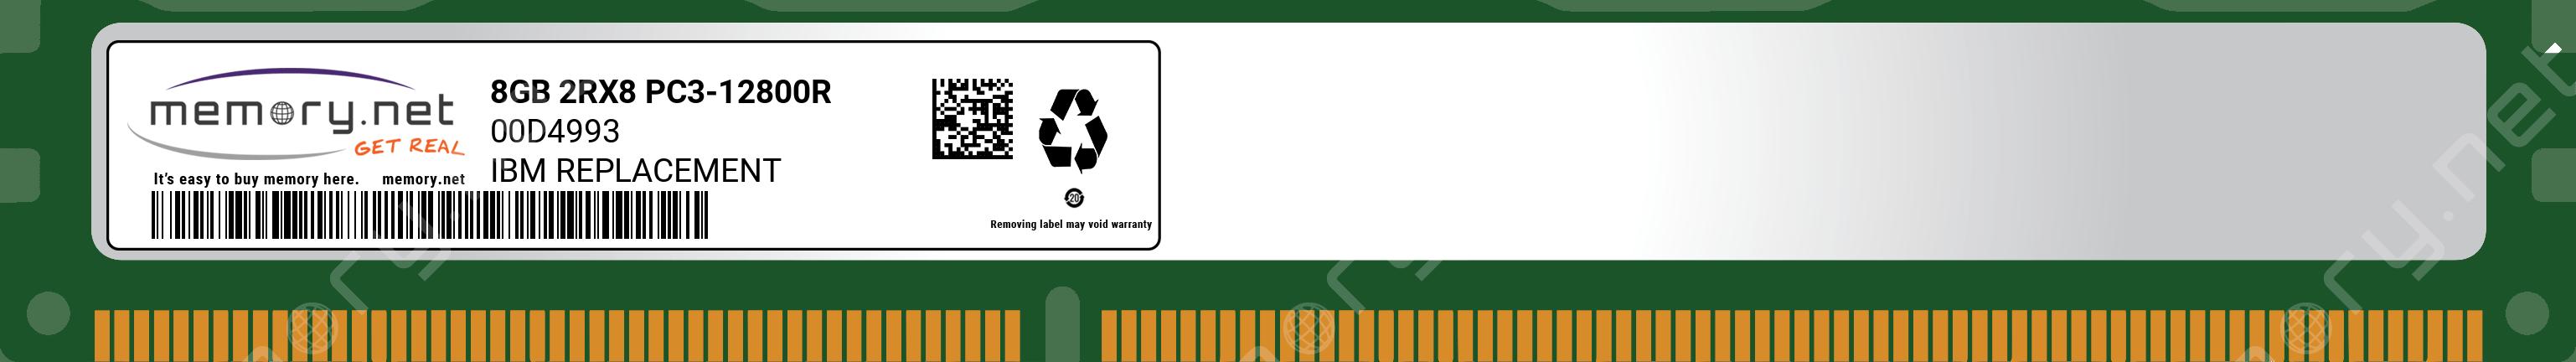 00D4993